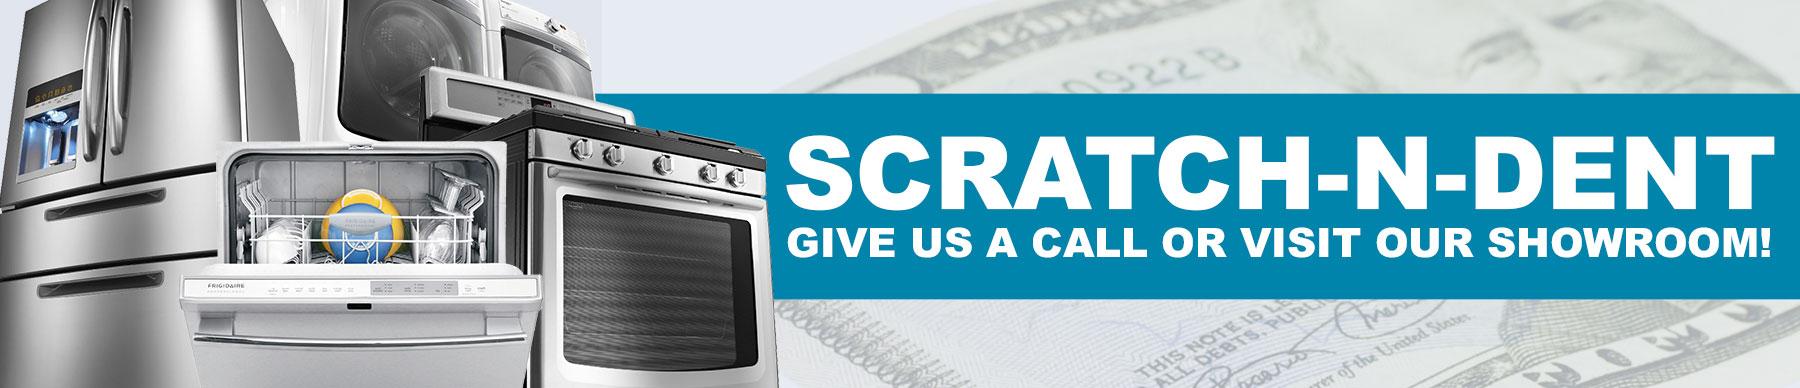 Arizona Discount Appliance - Scratch N Dent | Arizona Discount Appliance